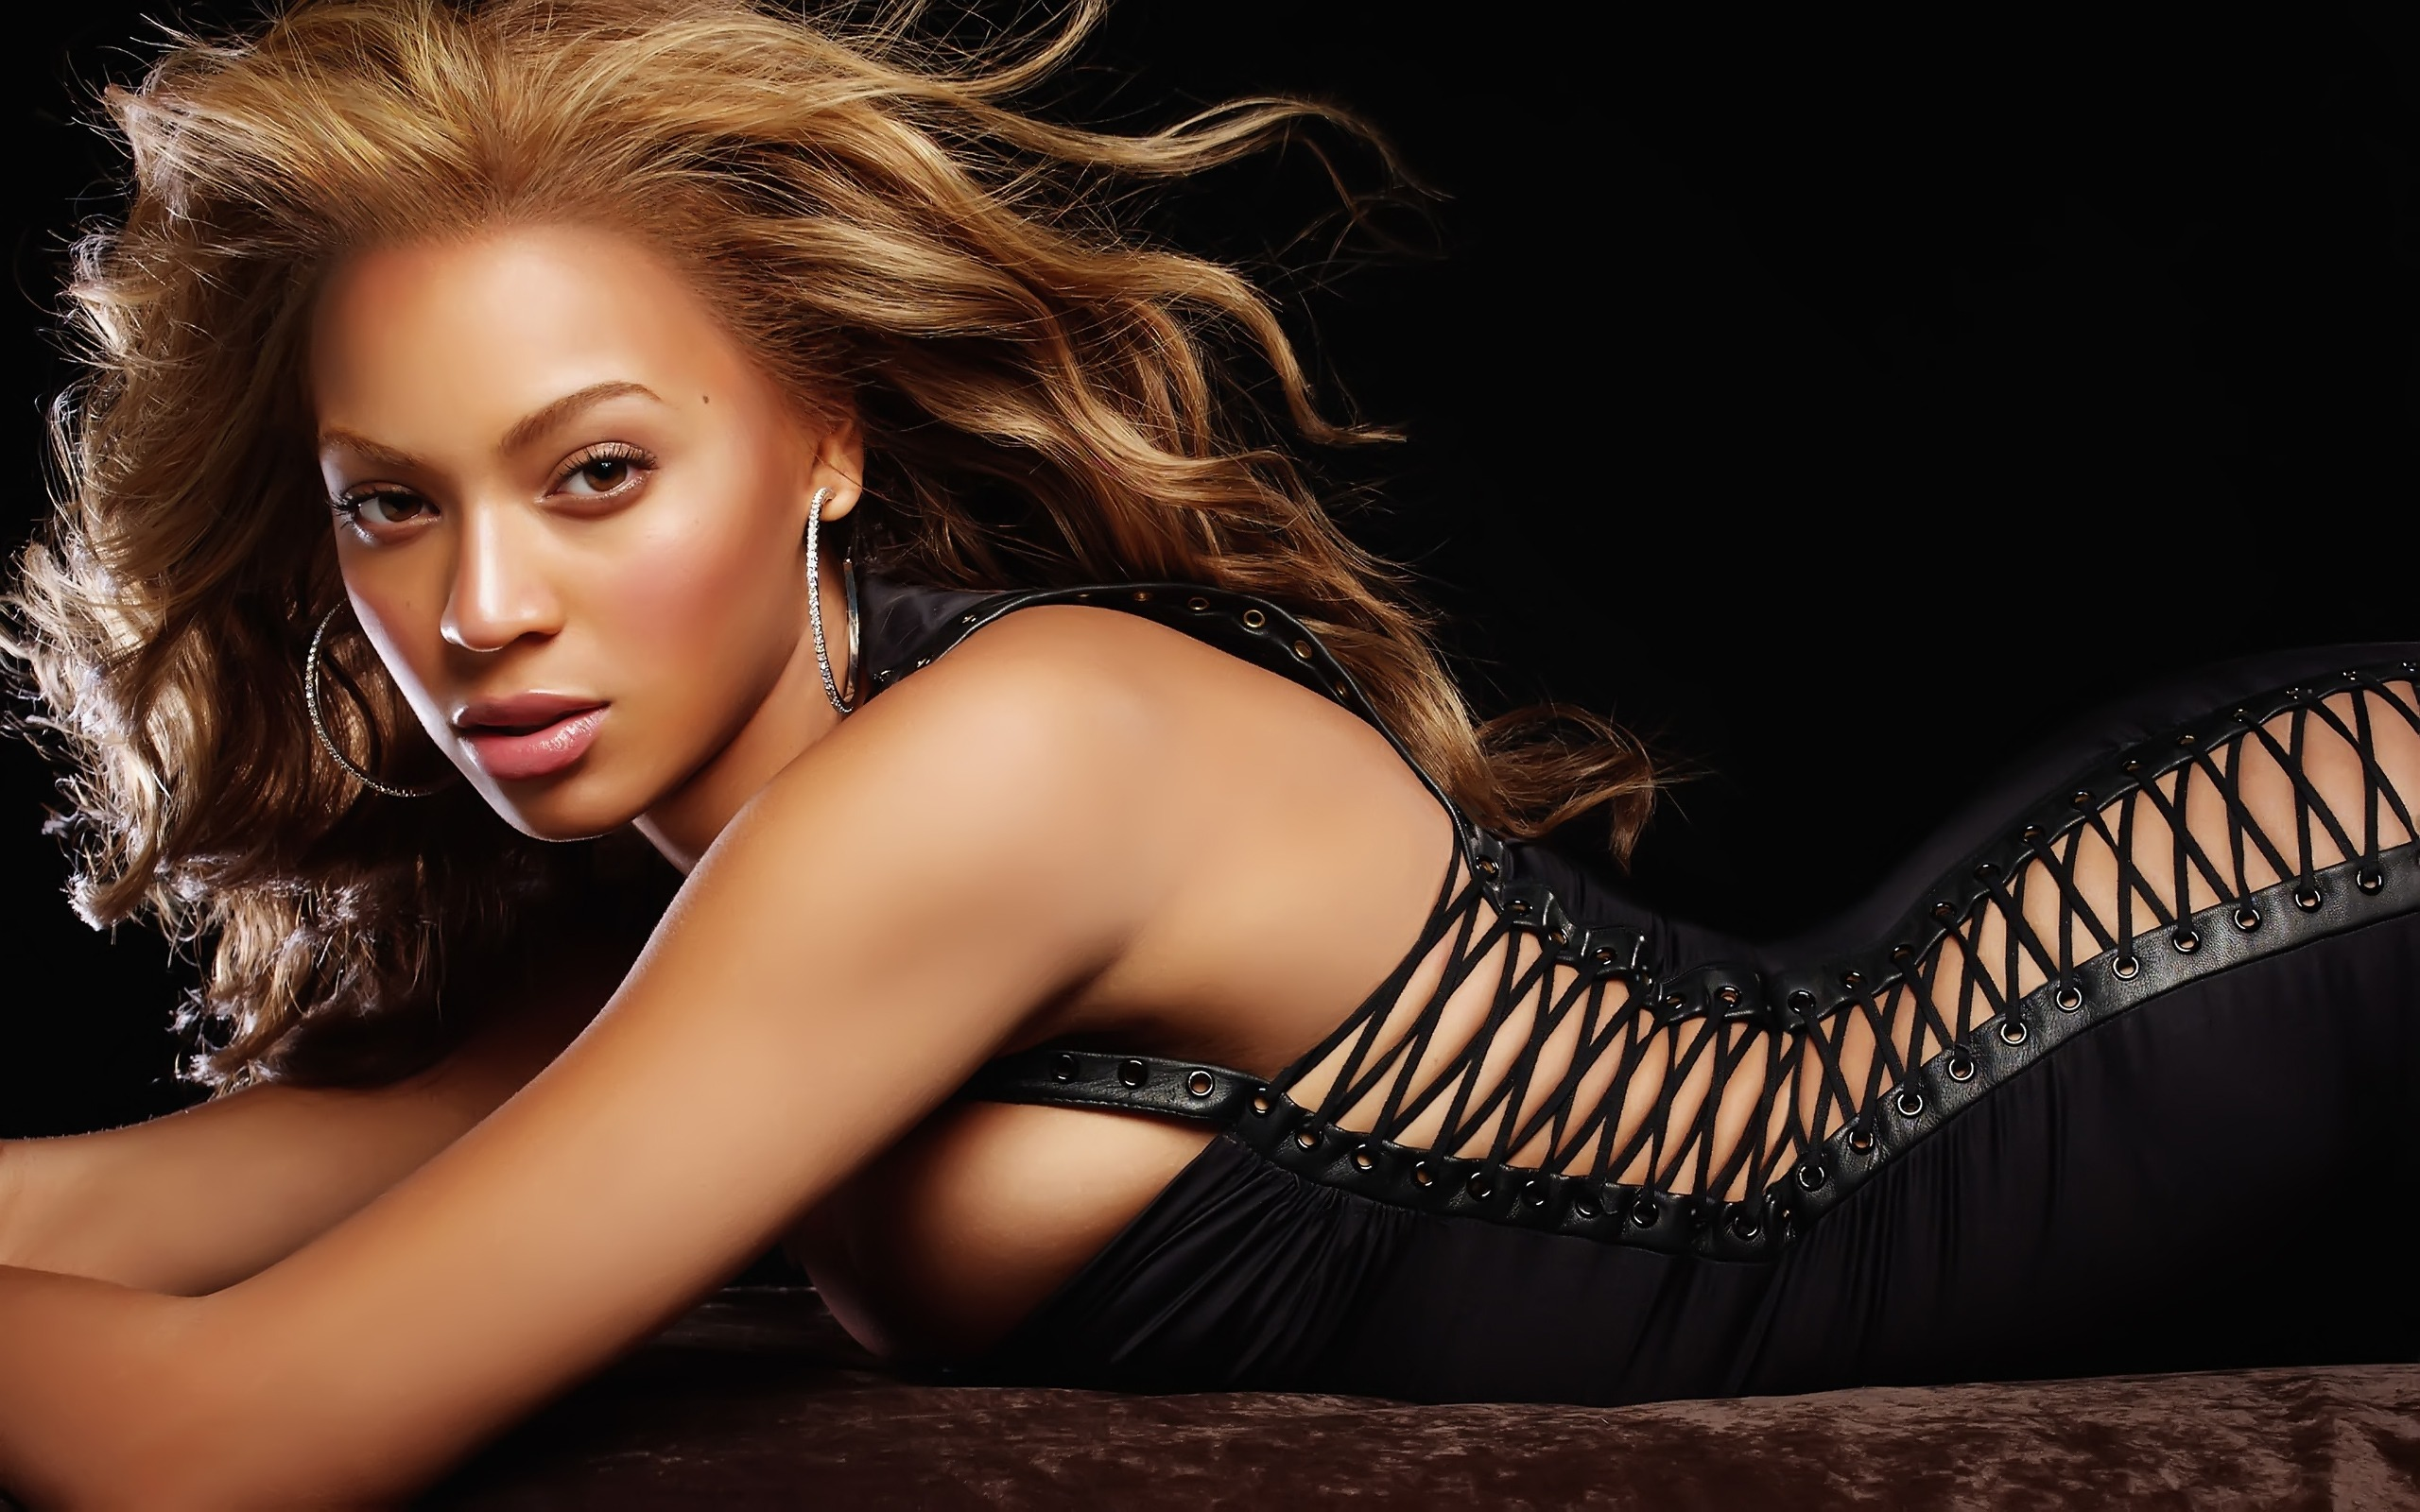 Beyonce Knowles HD Wallpaper